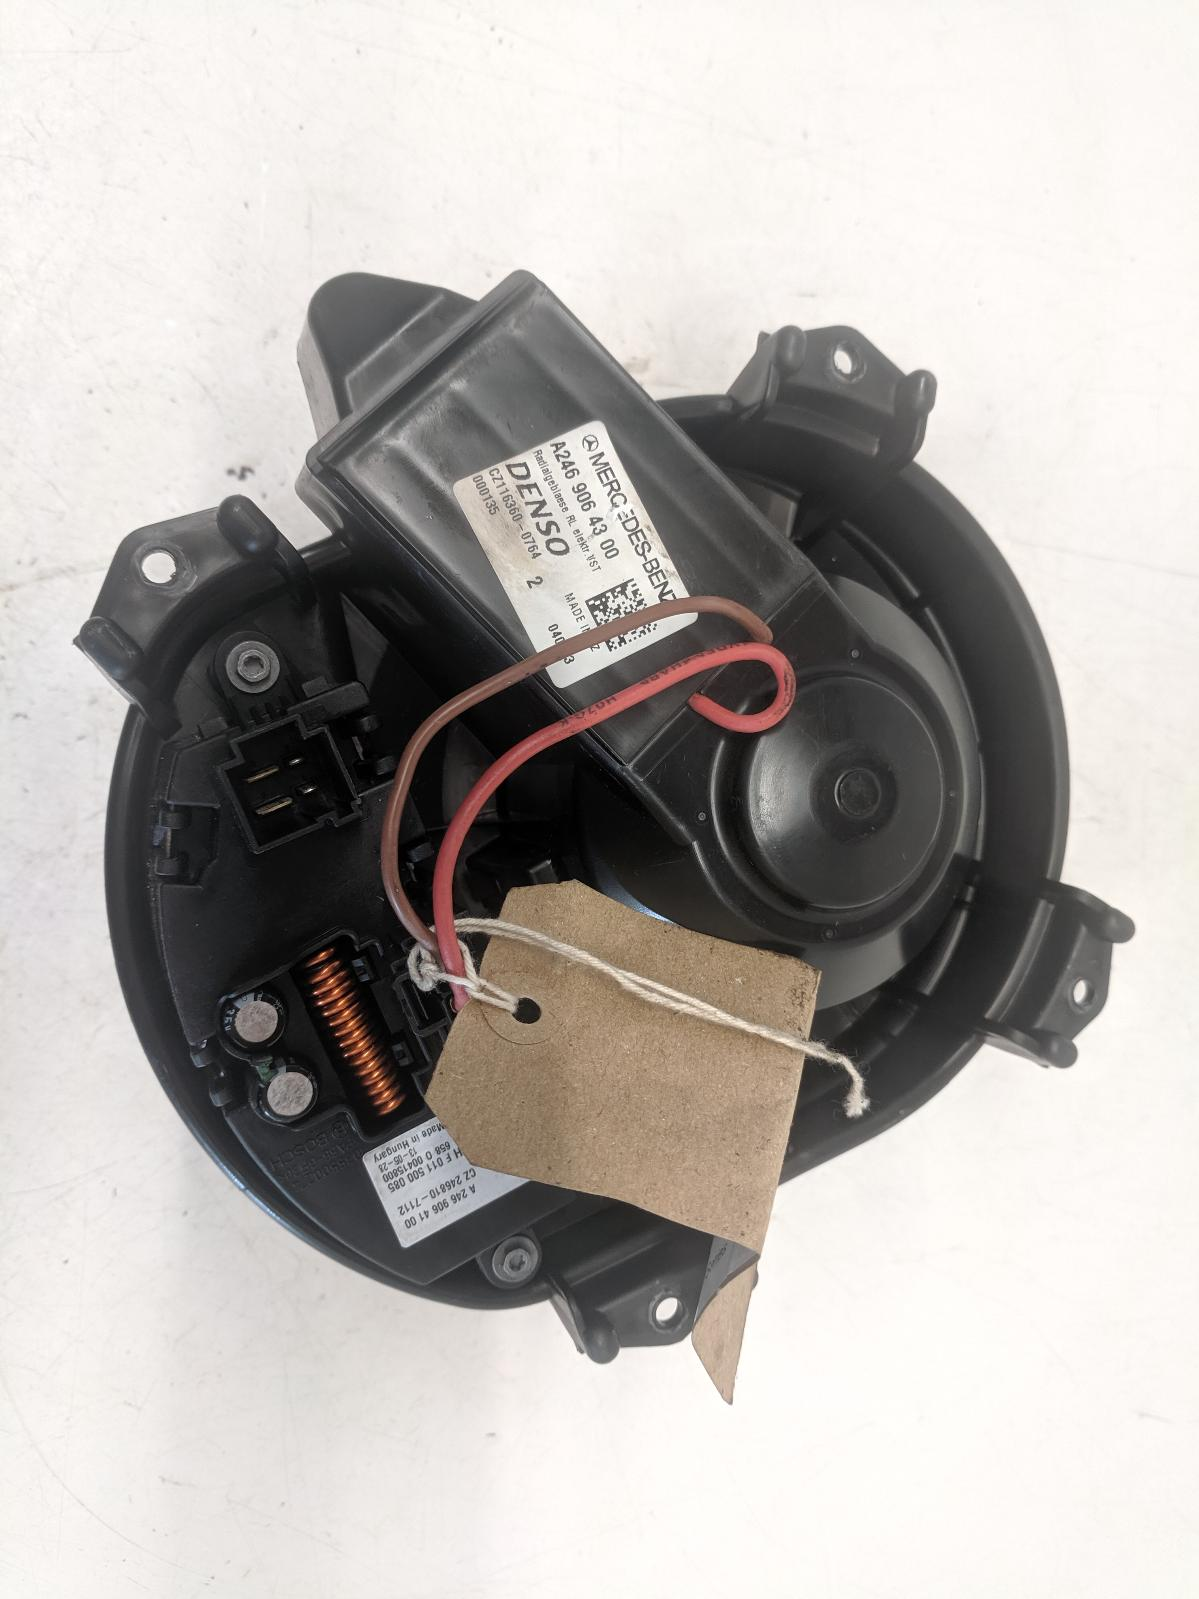 View Auto part Heater Motor/Assembly MERCEDES A CLASS 2013